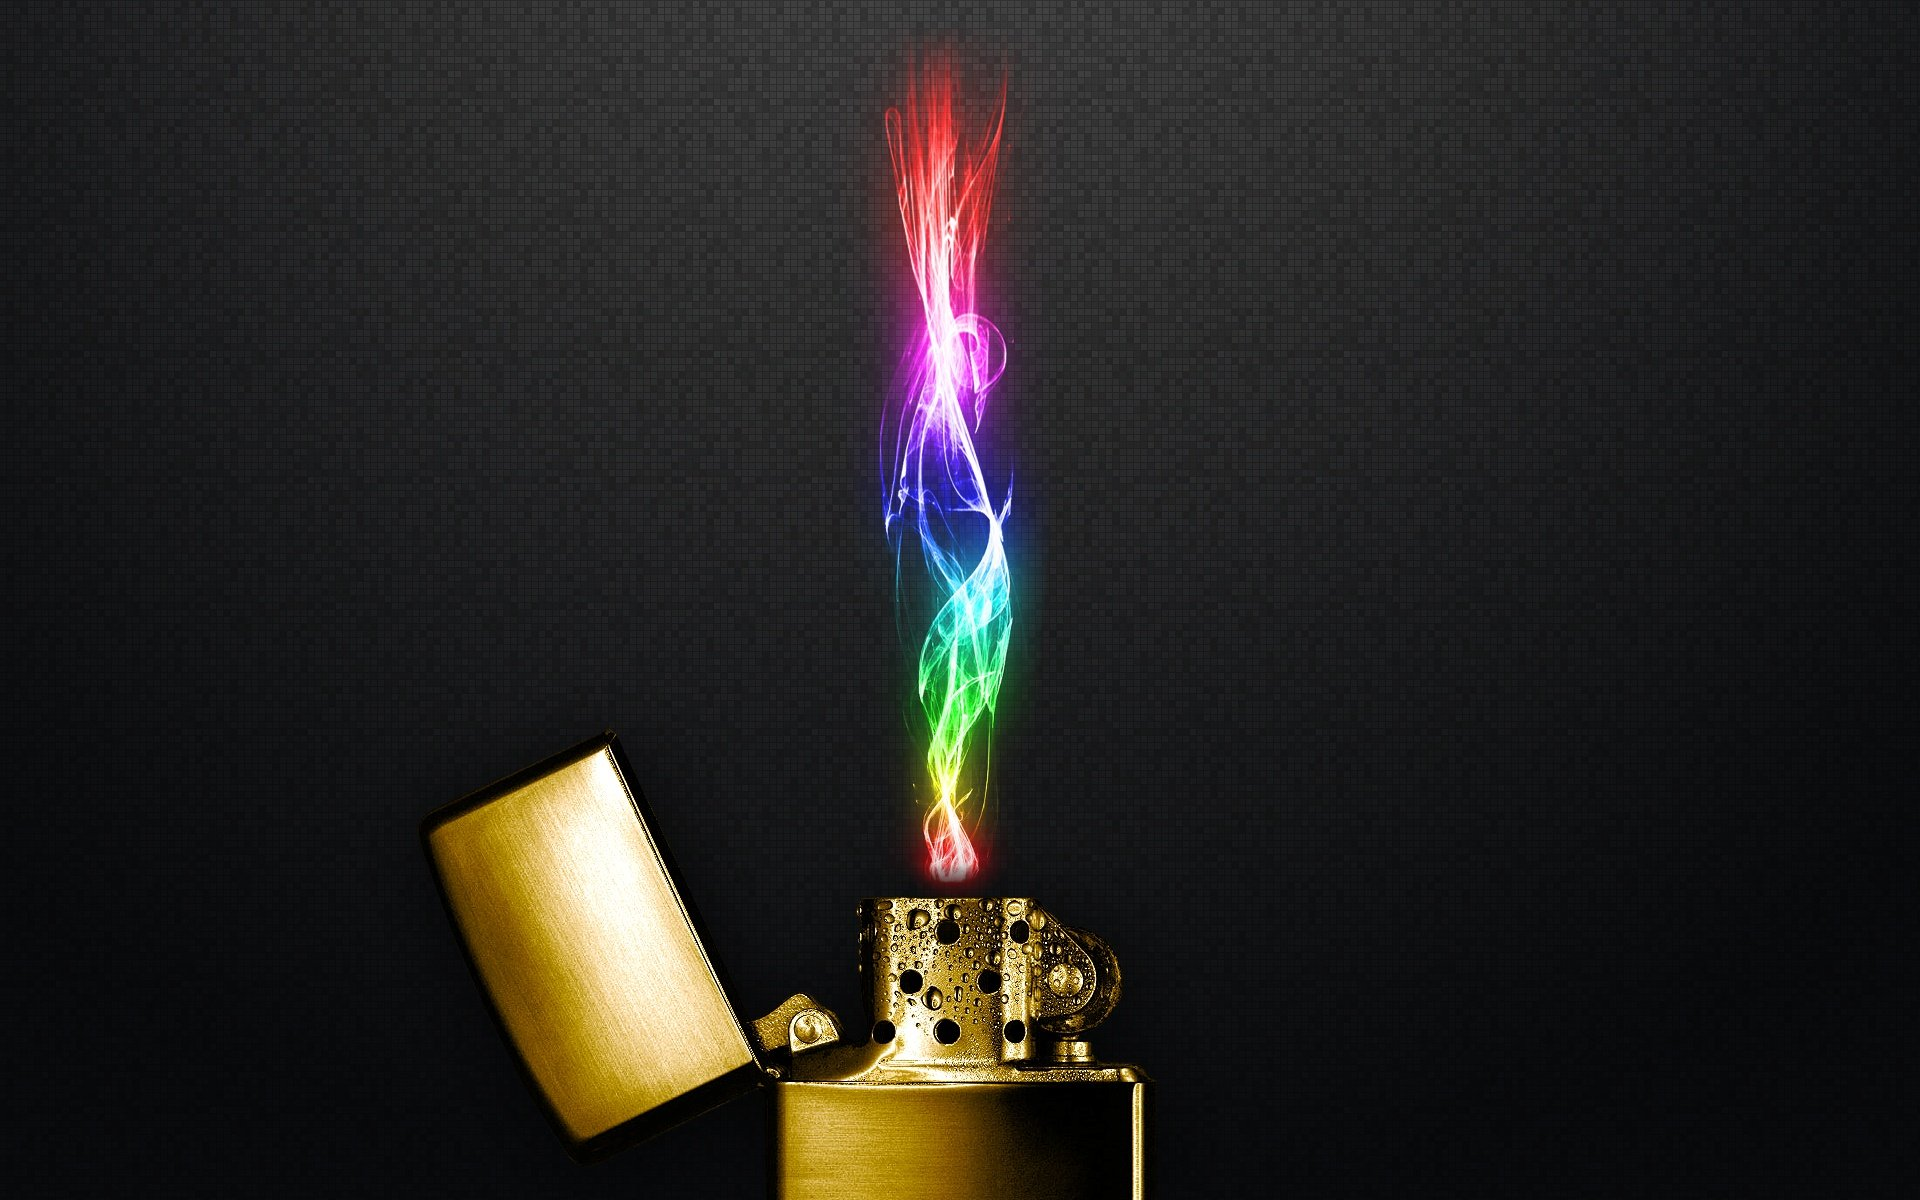 multicolor zippo lighters flame wallpaper 1920x1200